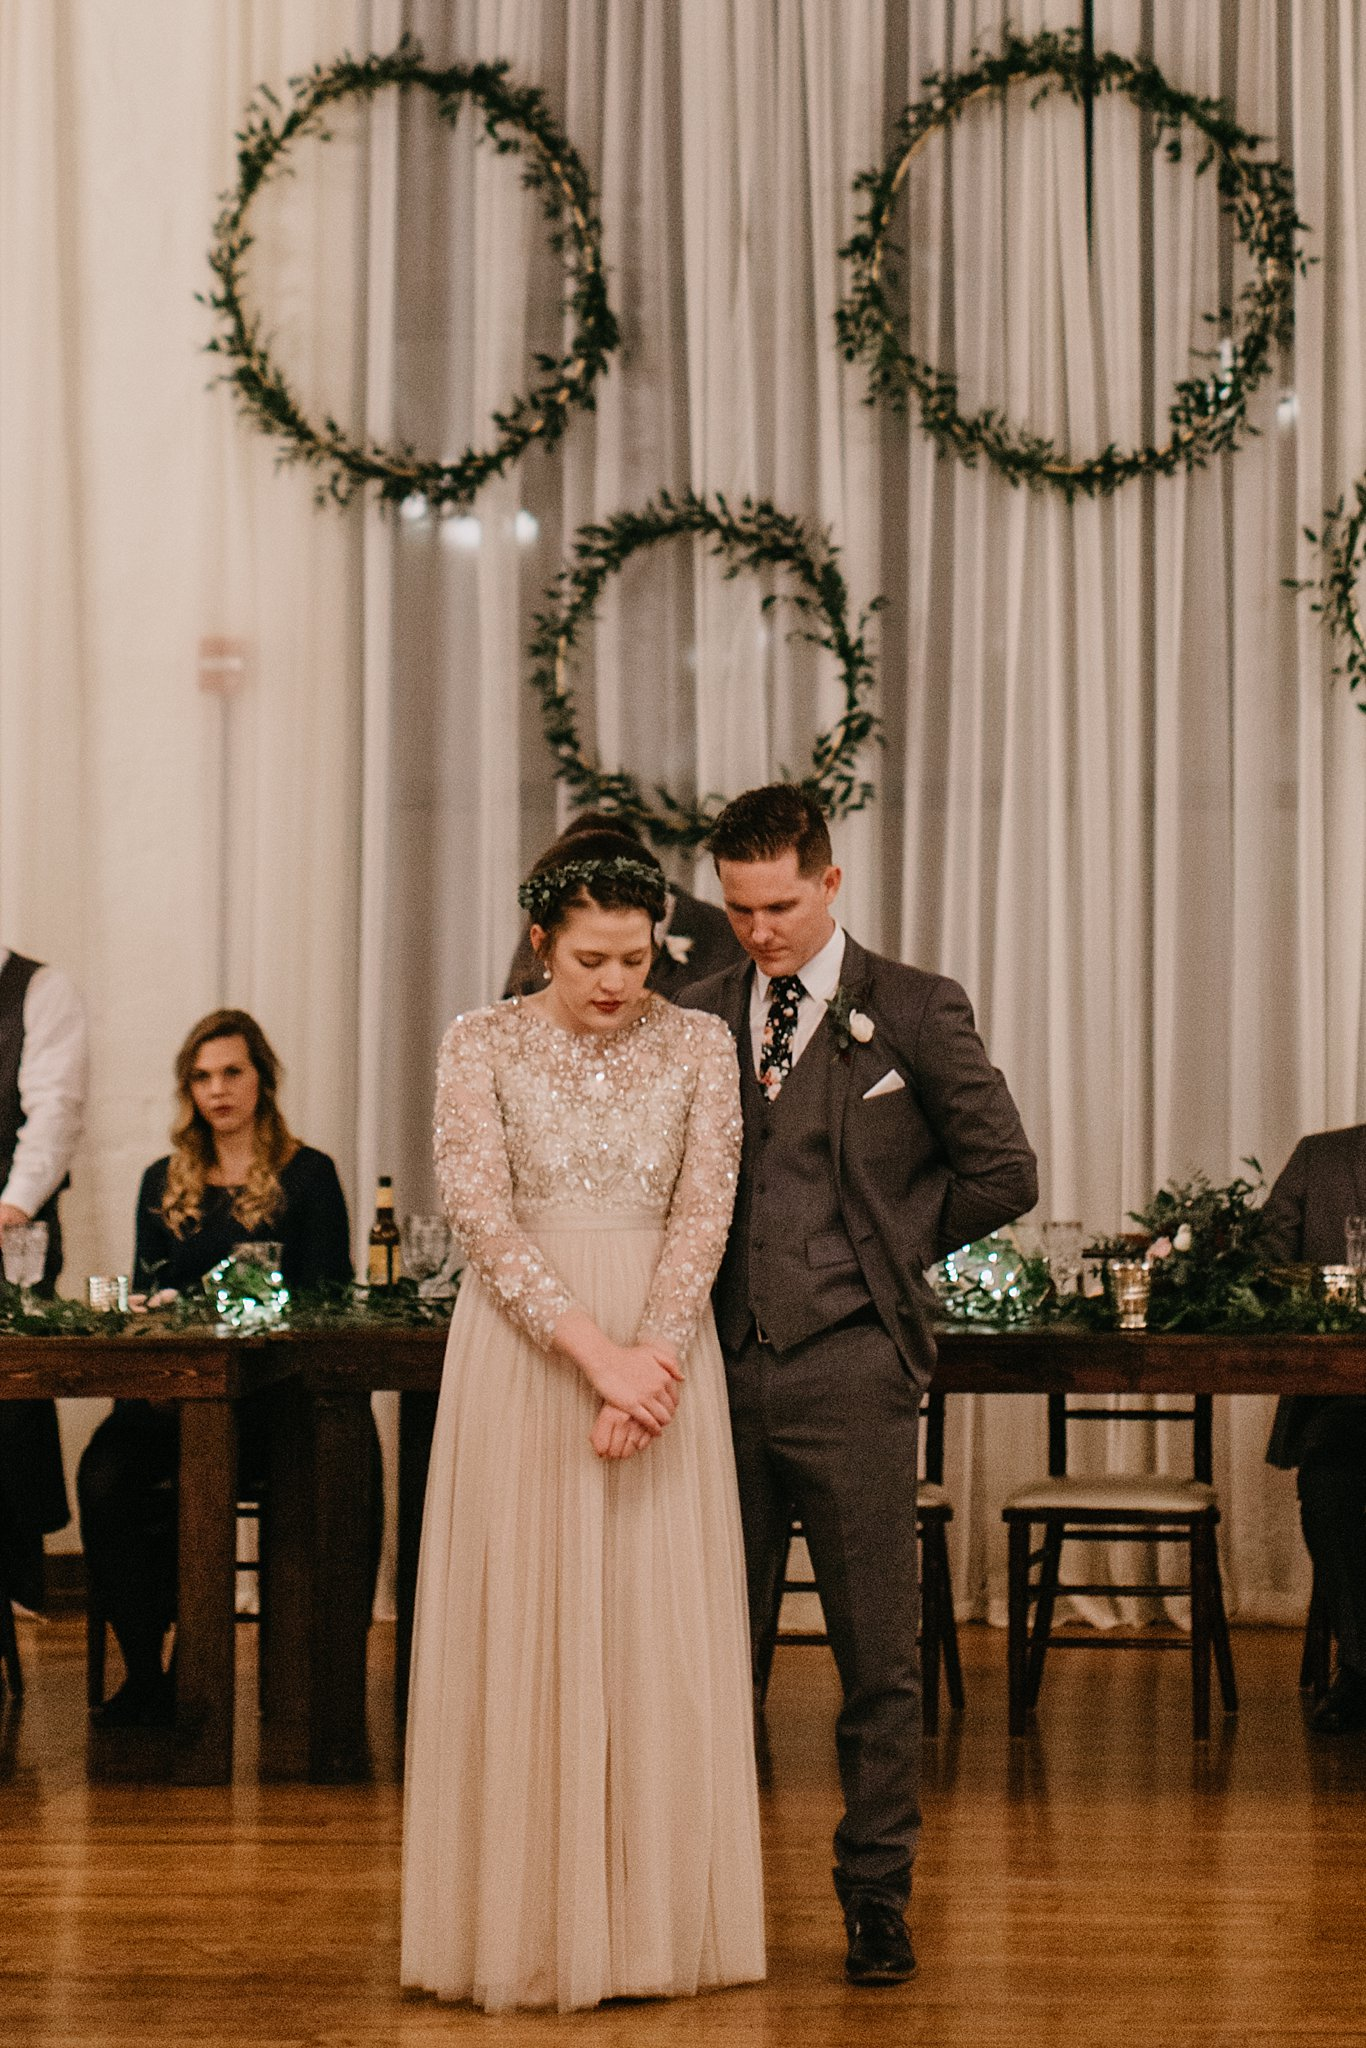 Wilderlove Co_Waco Texas_The Phoenix_Romantic Wedding Photography_0082.jpg